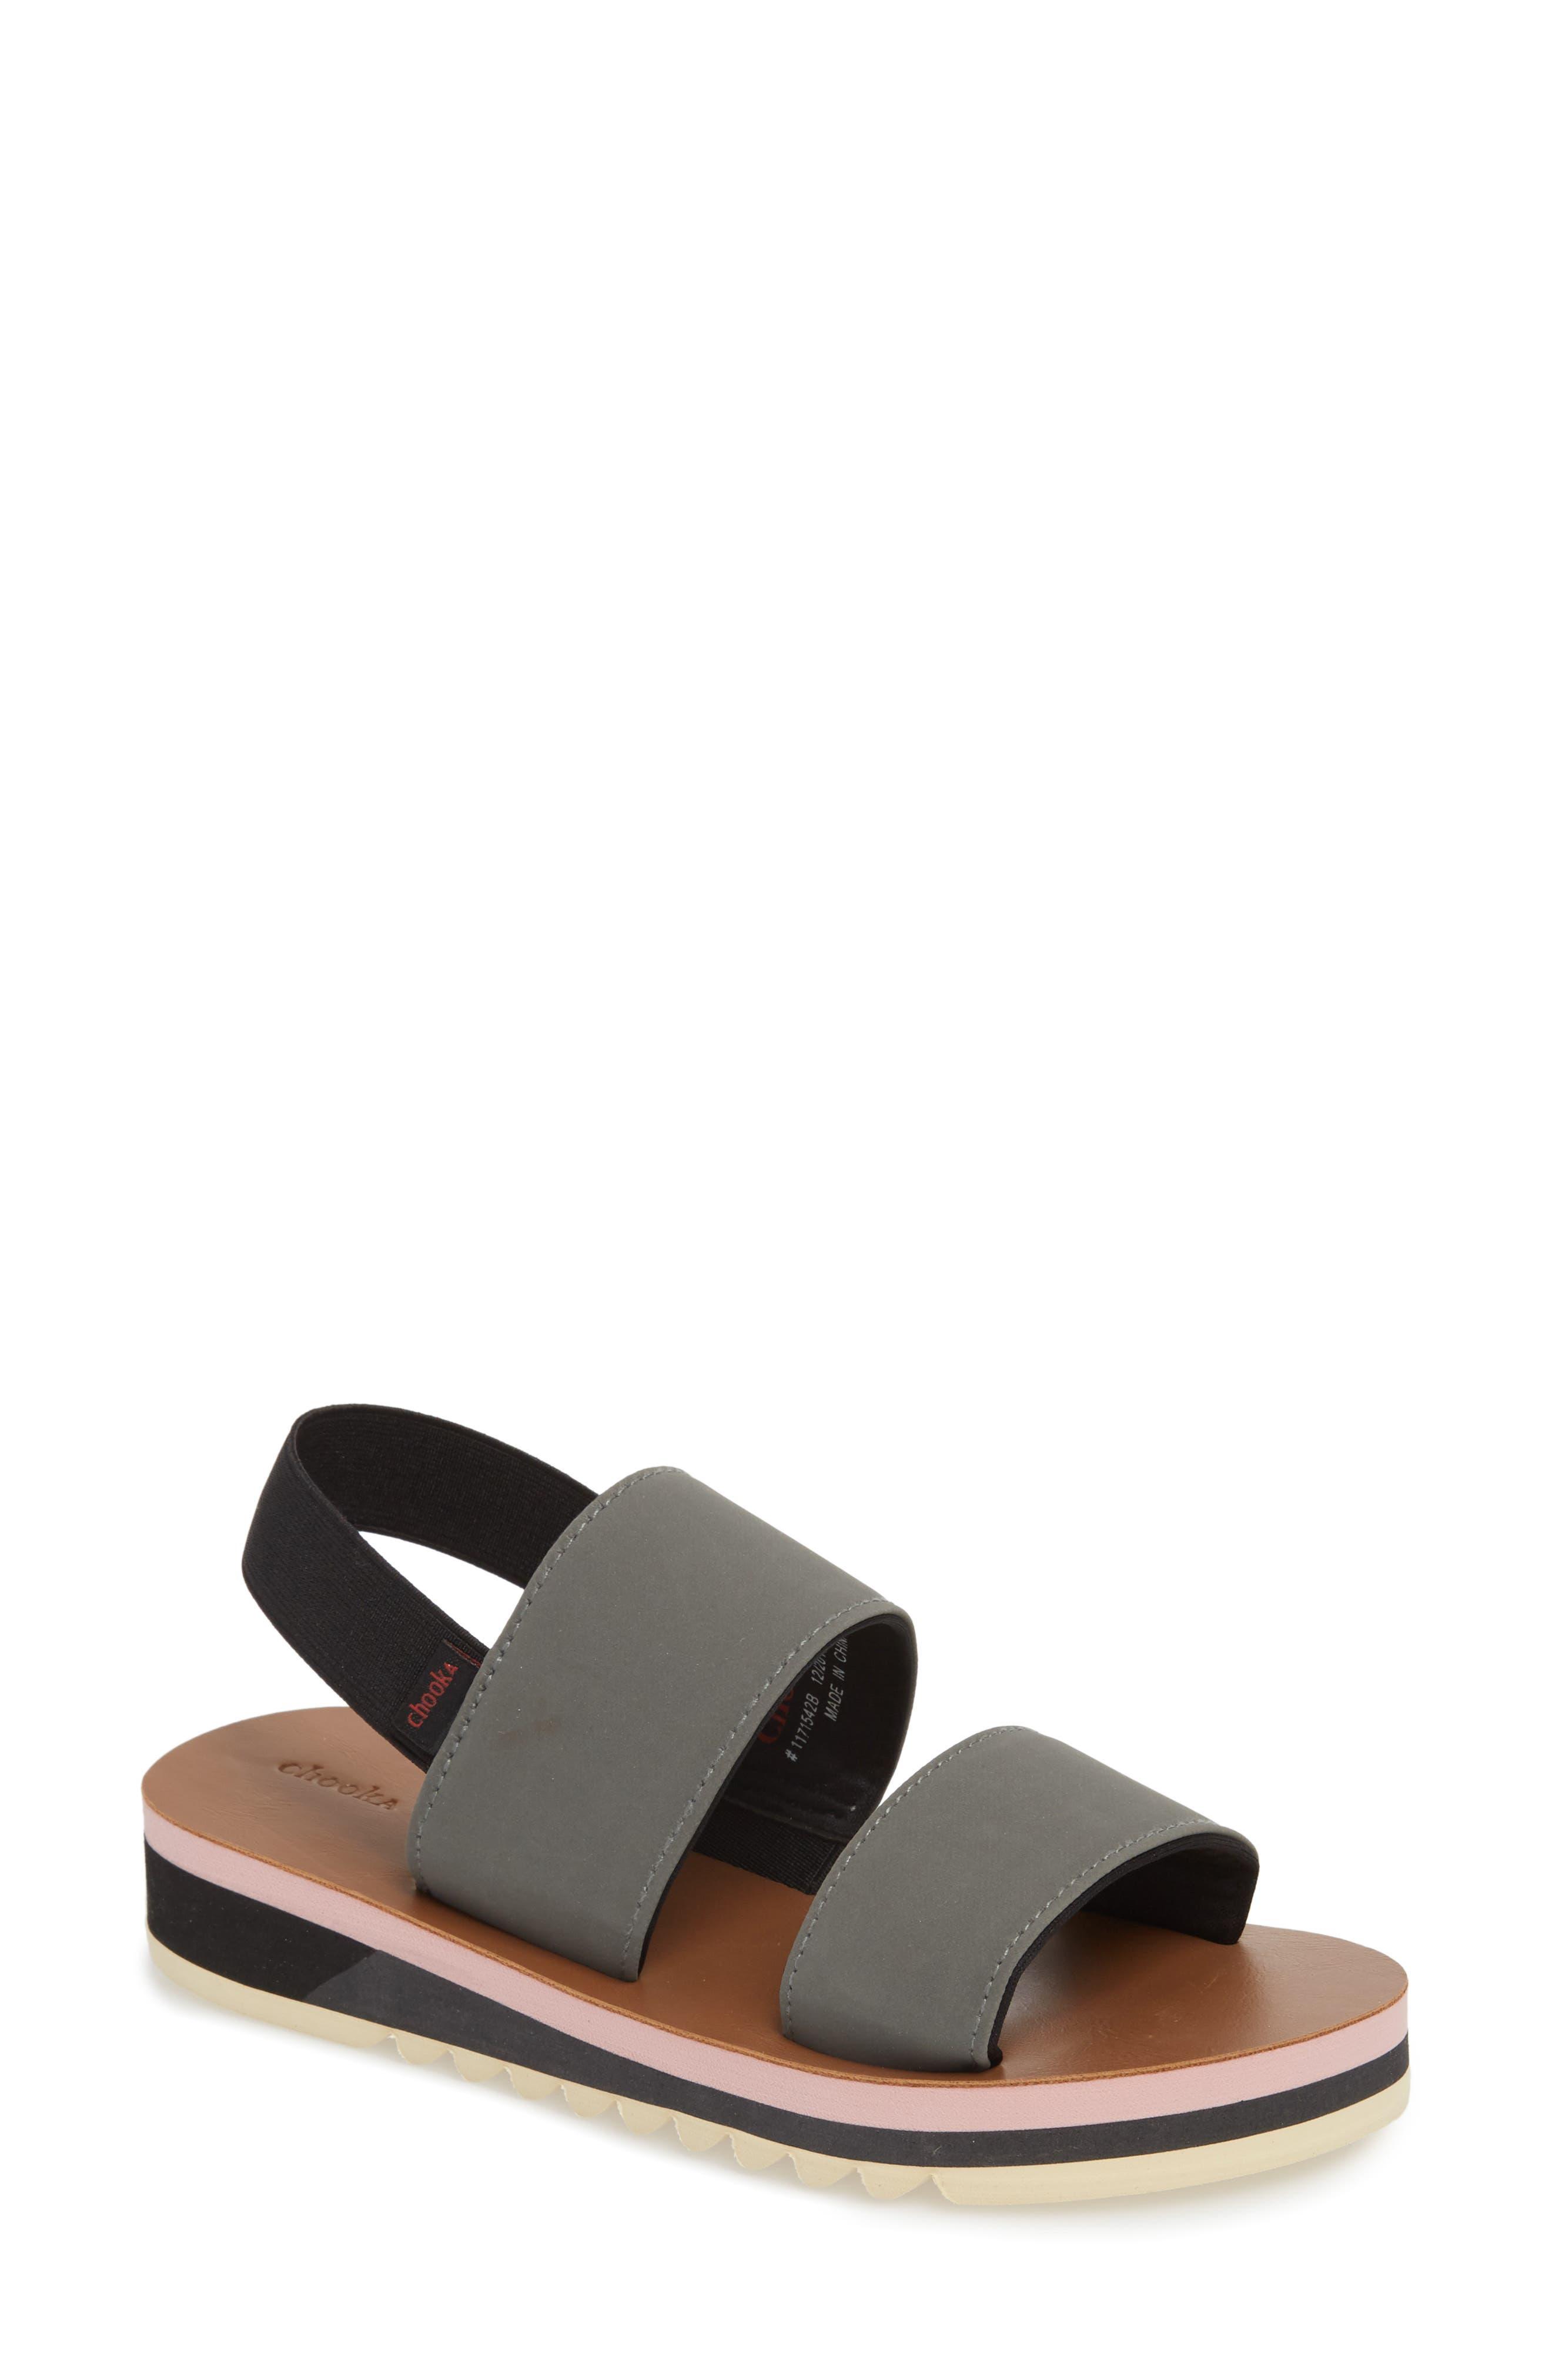 Flatform Sandal,                             Main thumbnail 1, color,                             GREY